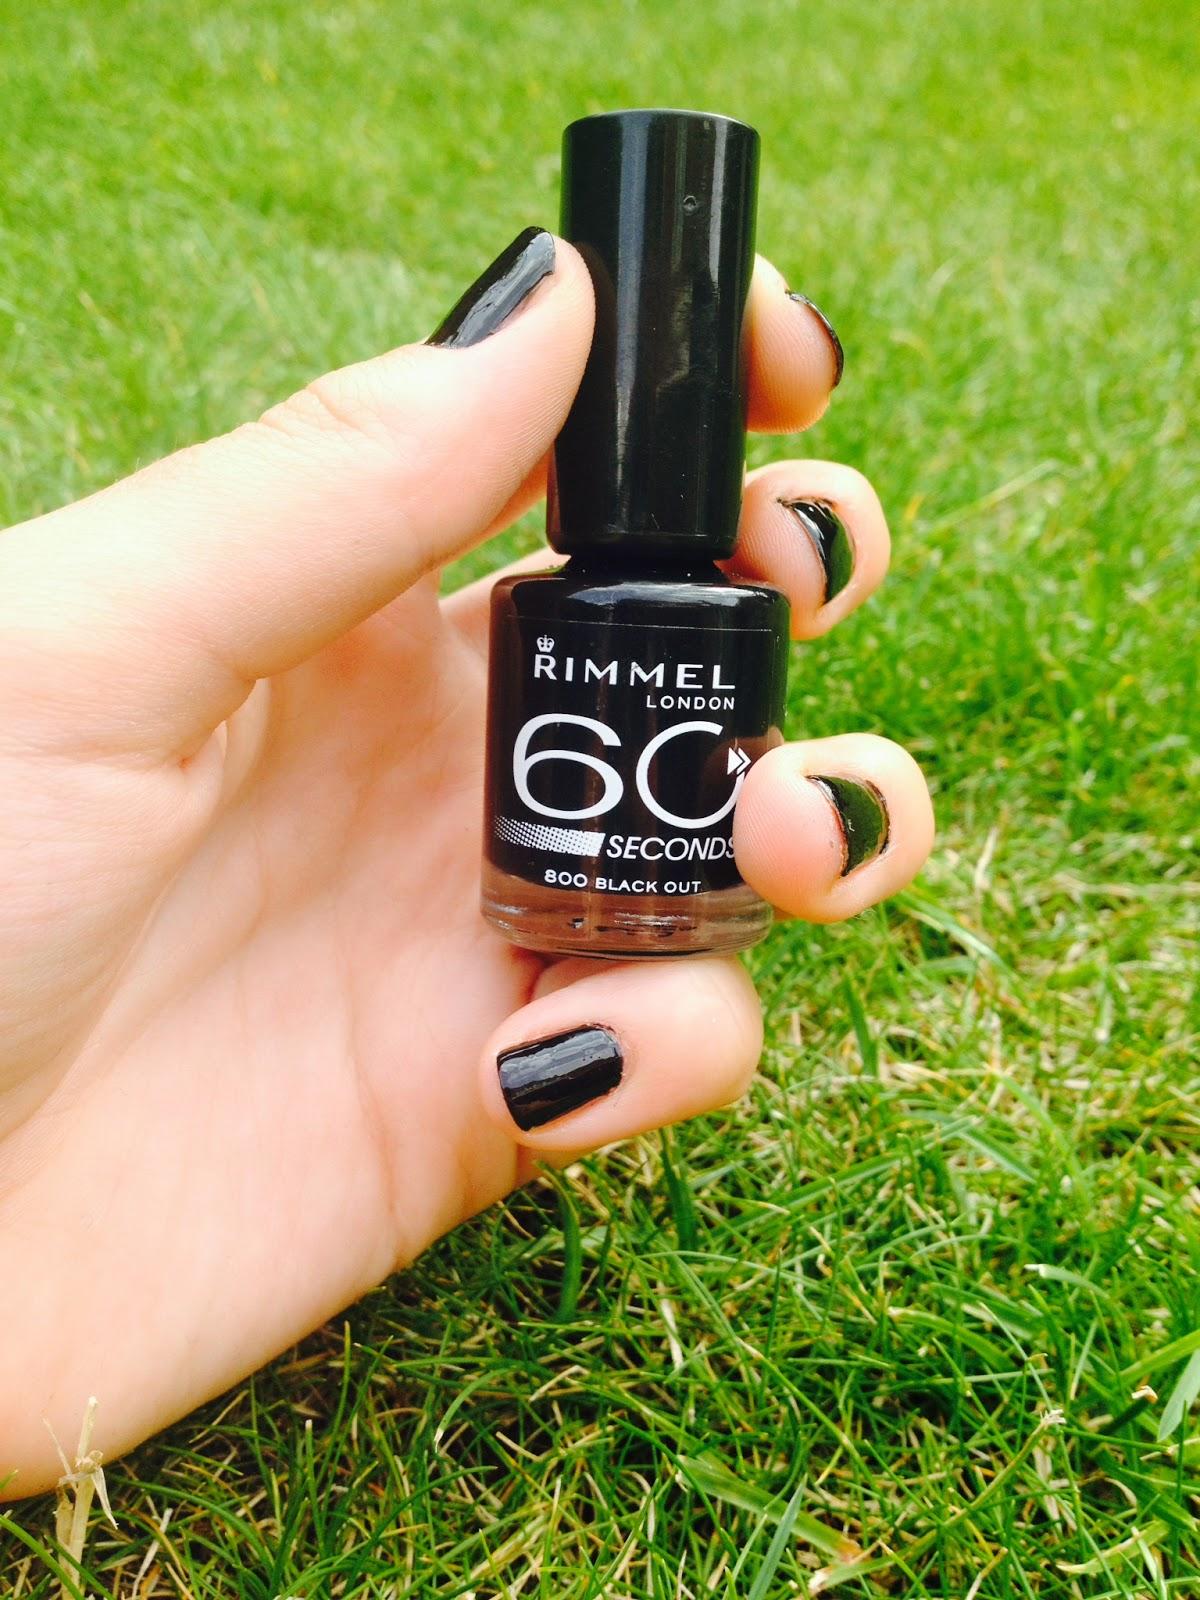 Rimmel 60 Second Nail Polish Review   Beauty Billboard